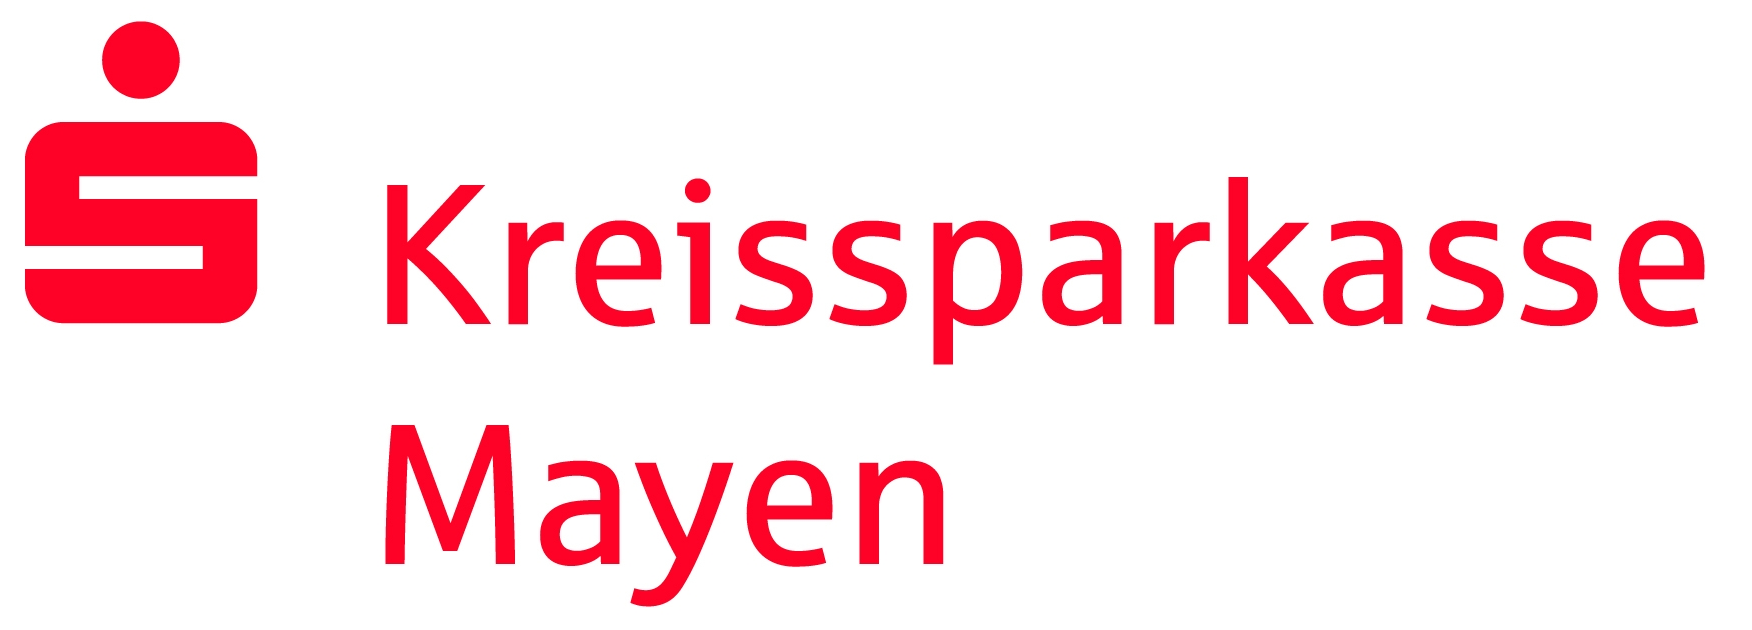 Kreissparkasse Mayen